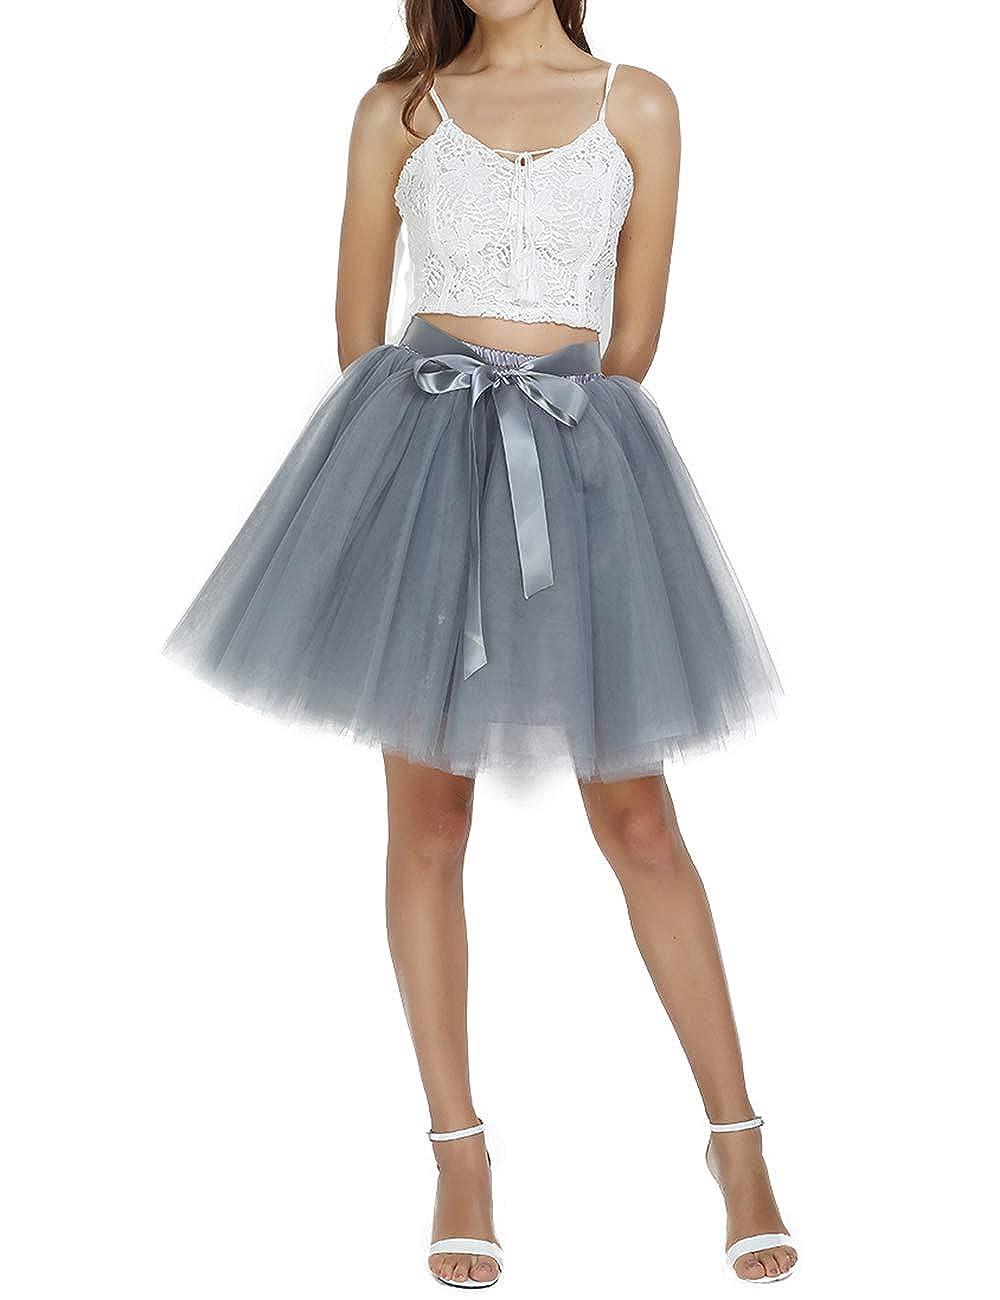 e19b244696 Women's Above Knee High Waist Tutu Tulle Skirt Adult 7 Layers Dance  Petticoat